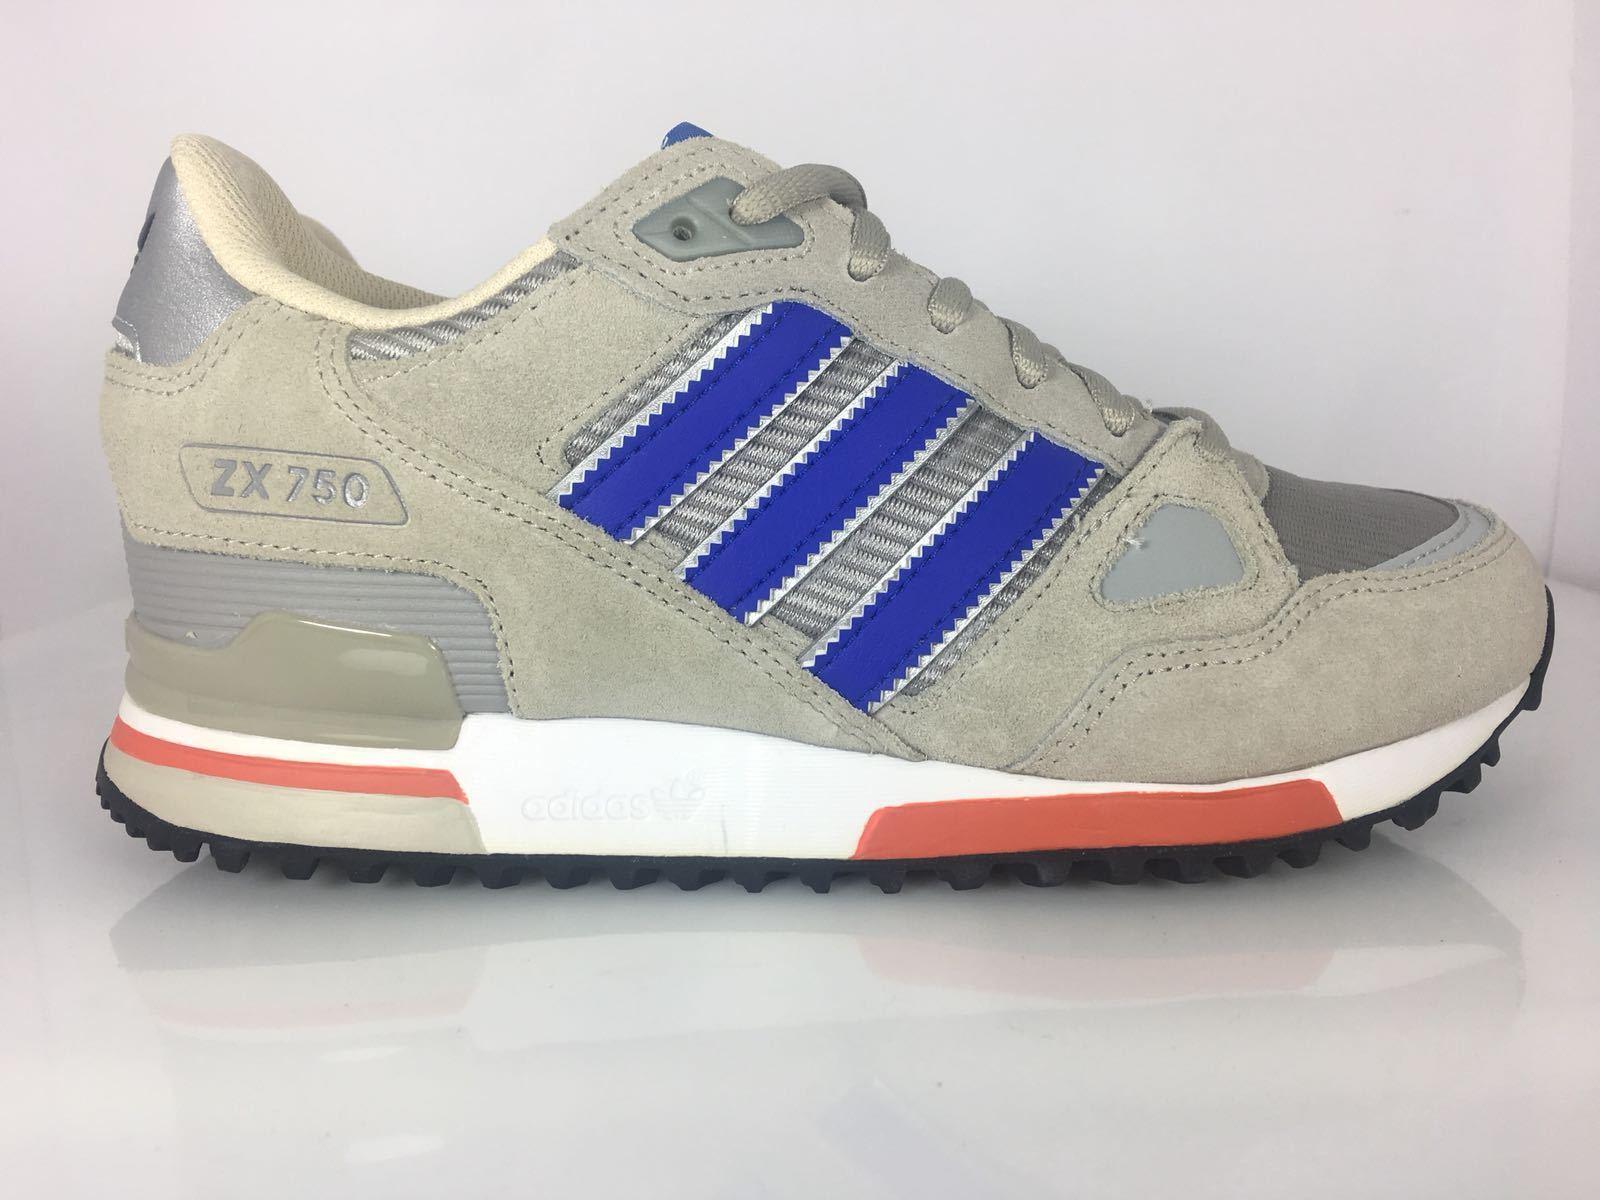 shoes N.36 2 3 UK 4 CM 22.5 ADIDAS ZX 750 ART. B24853